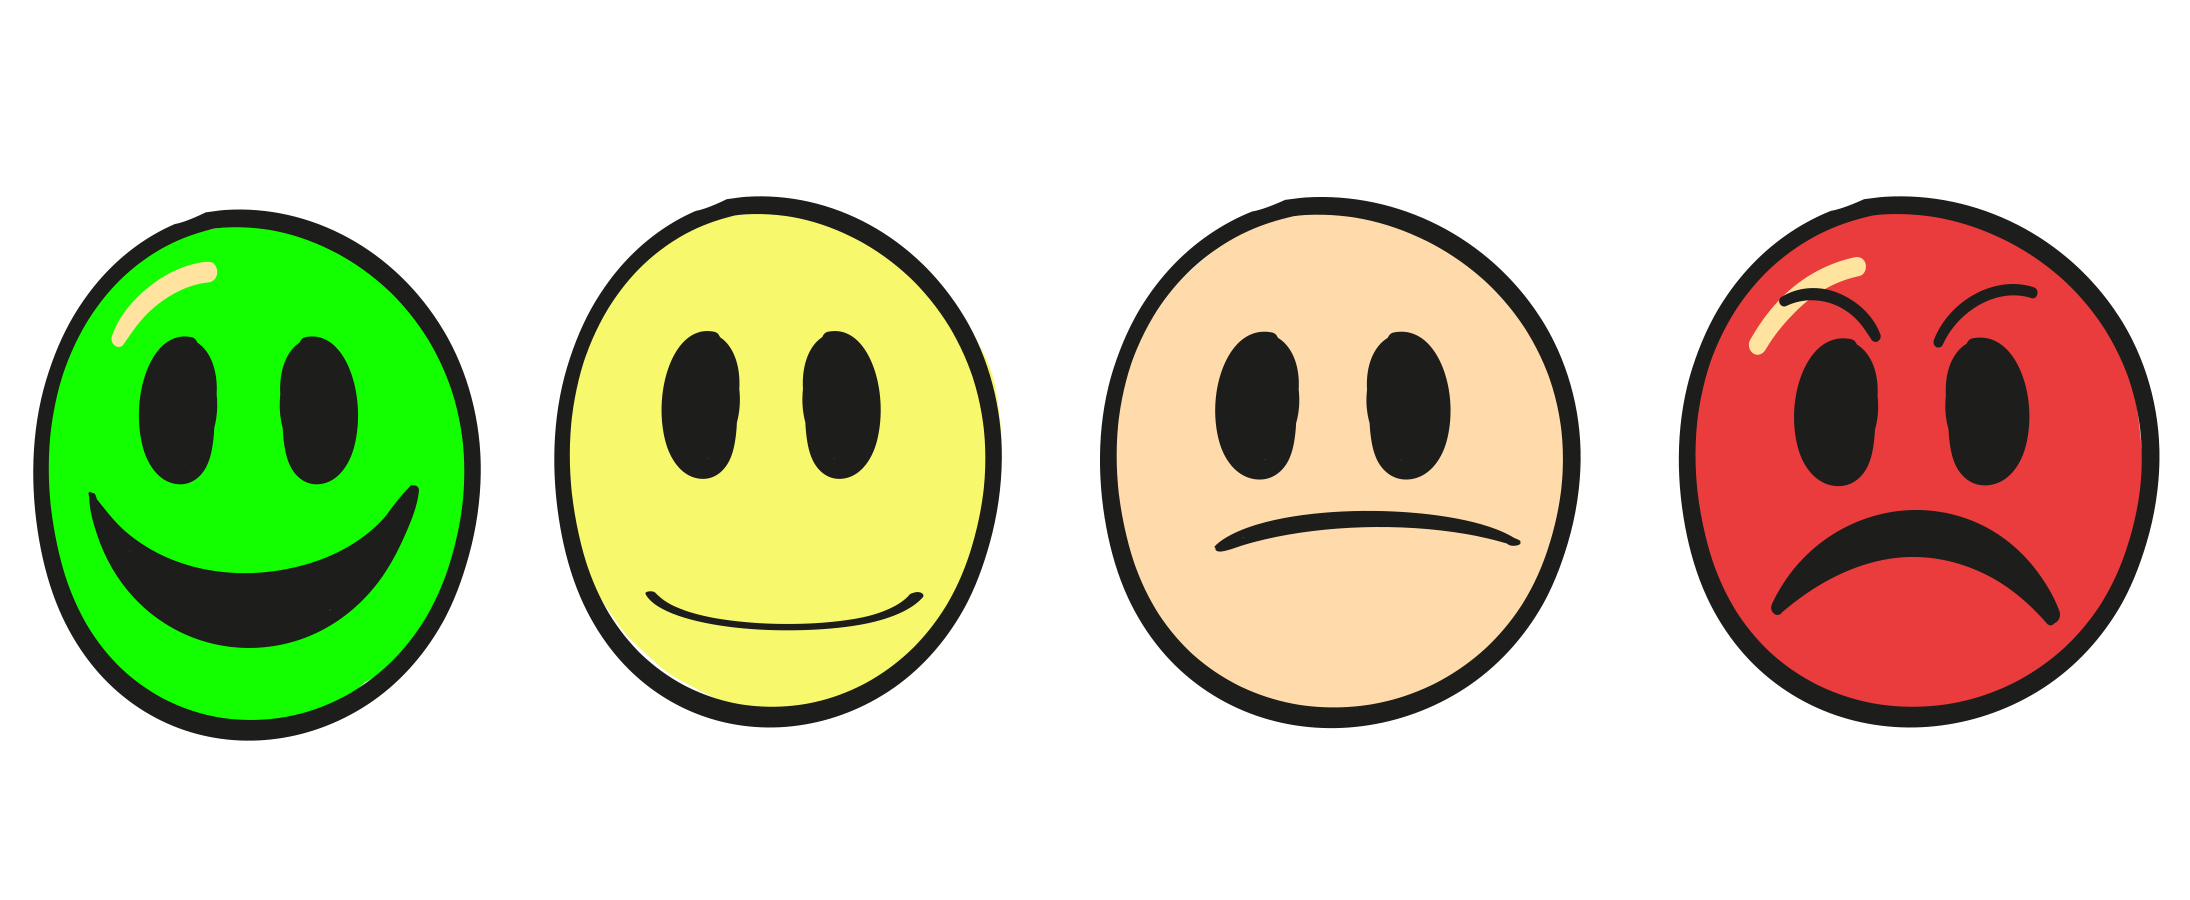 Smile Face Survey Kiosk